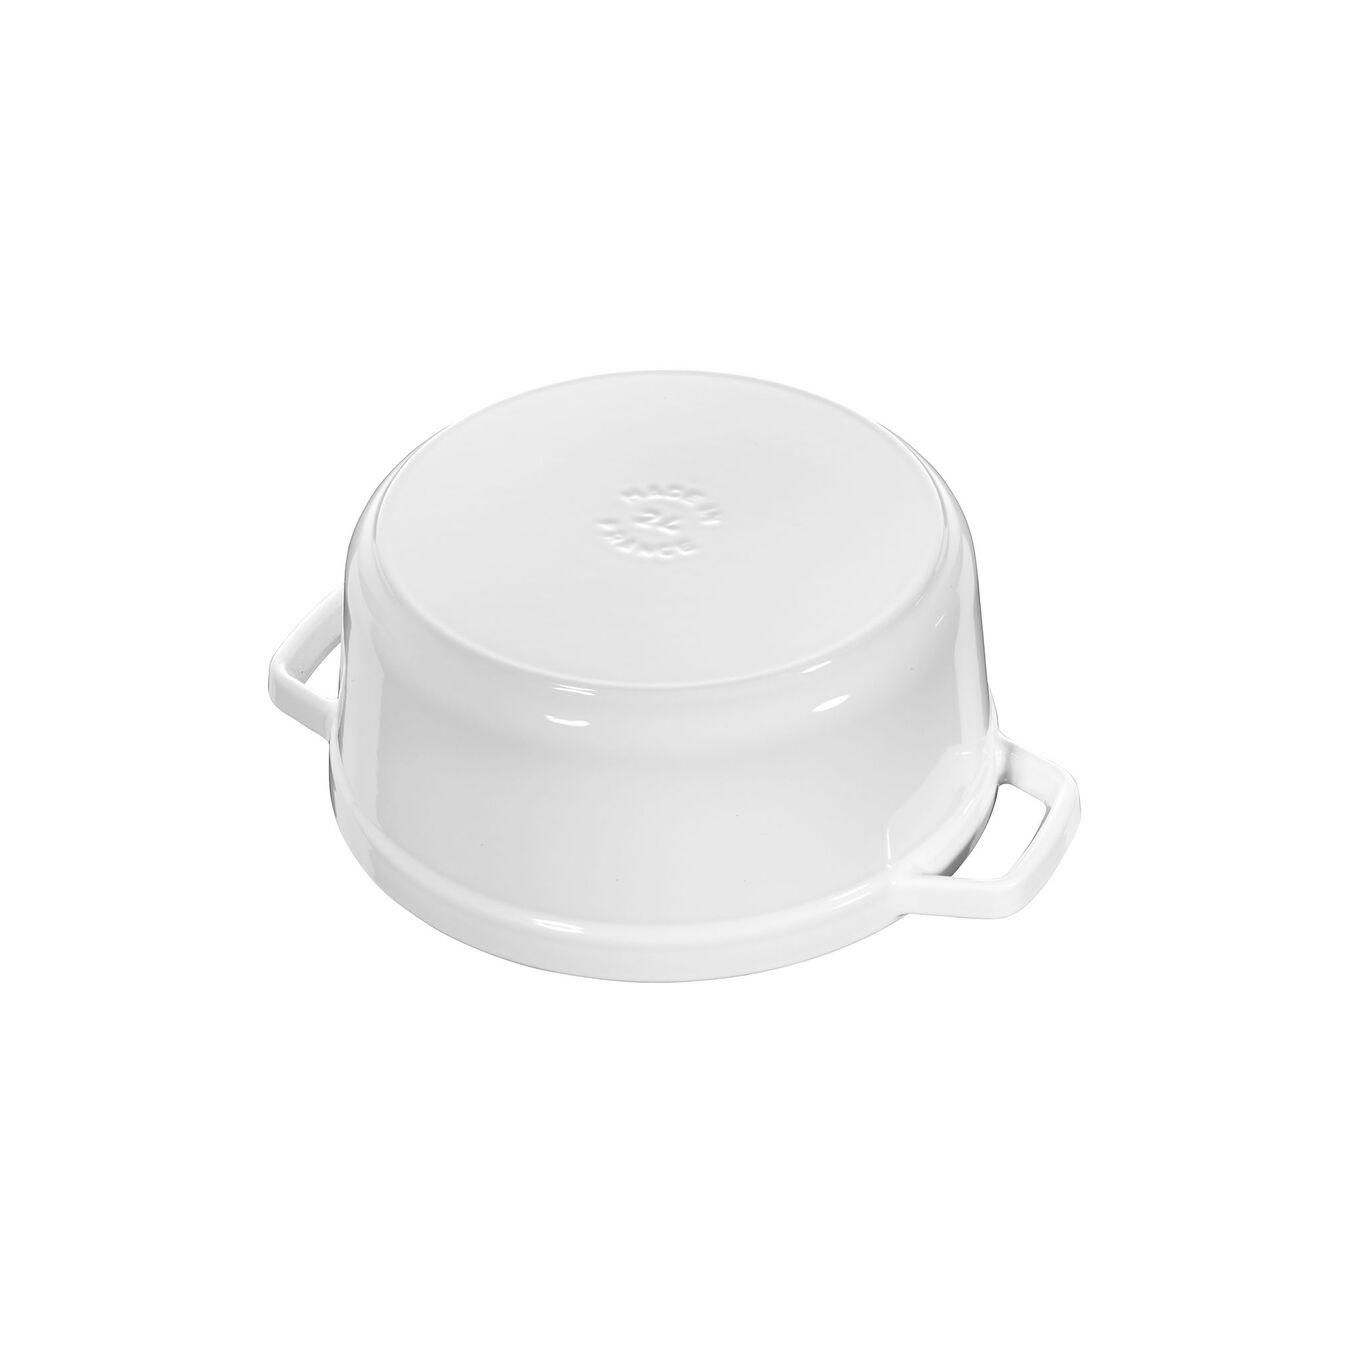 5.5-qt Round Cocotte - White,,large 2